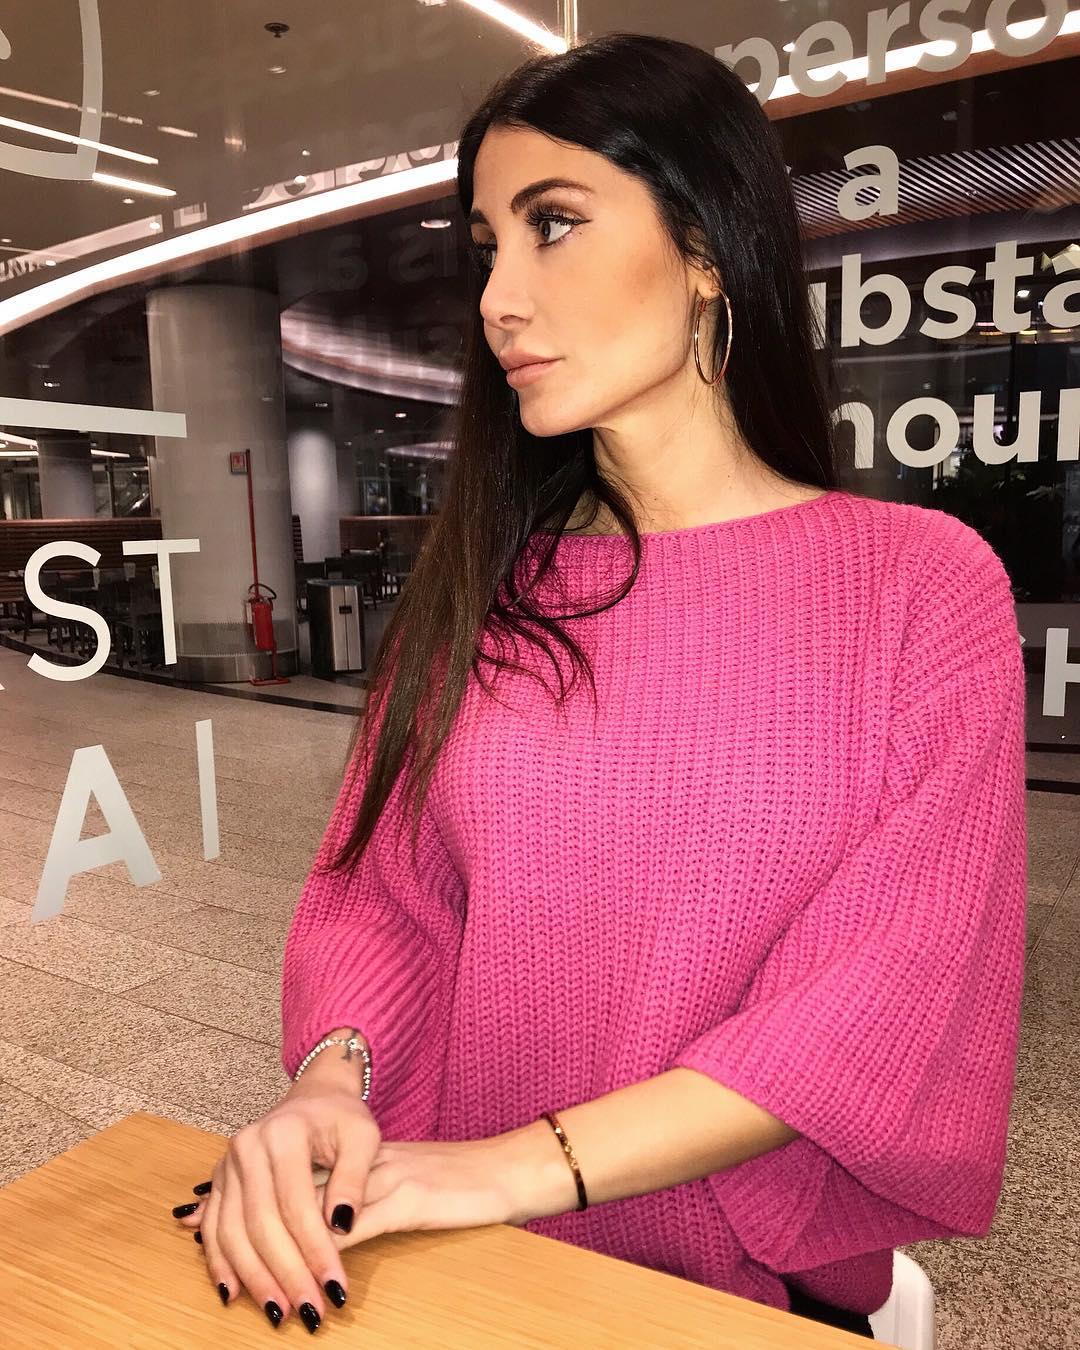 Elisabetta-Galimi-Wallpapers-Insta-Fit-Bio-15